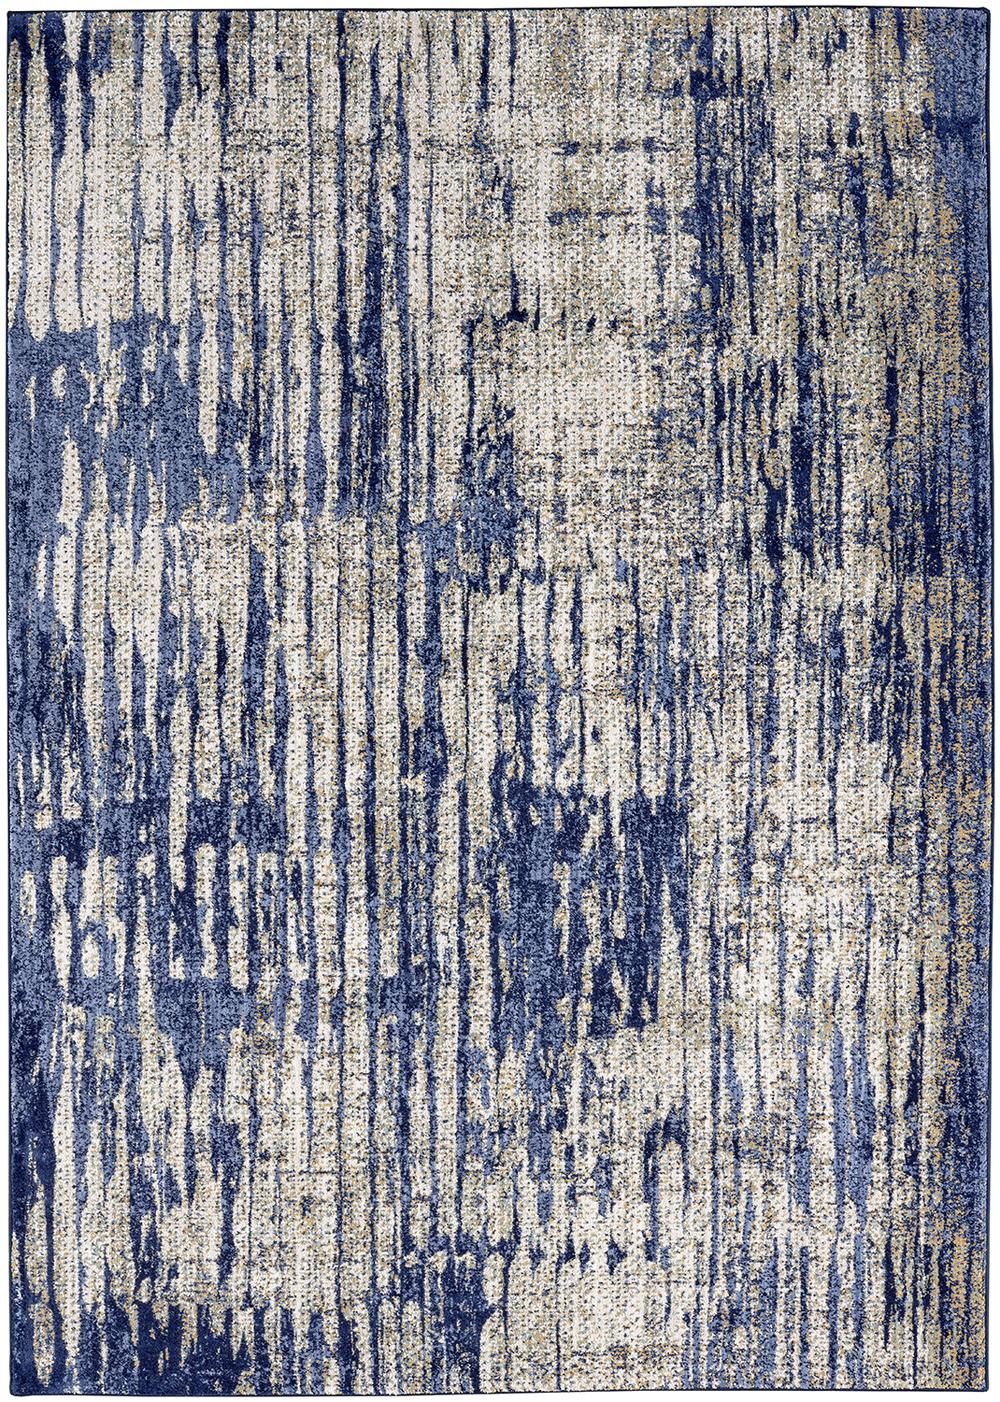 Karastan Cosmopolitan Mineral Bleu Indigo by Patina Vie Periwinkle Rug